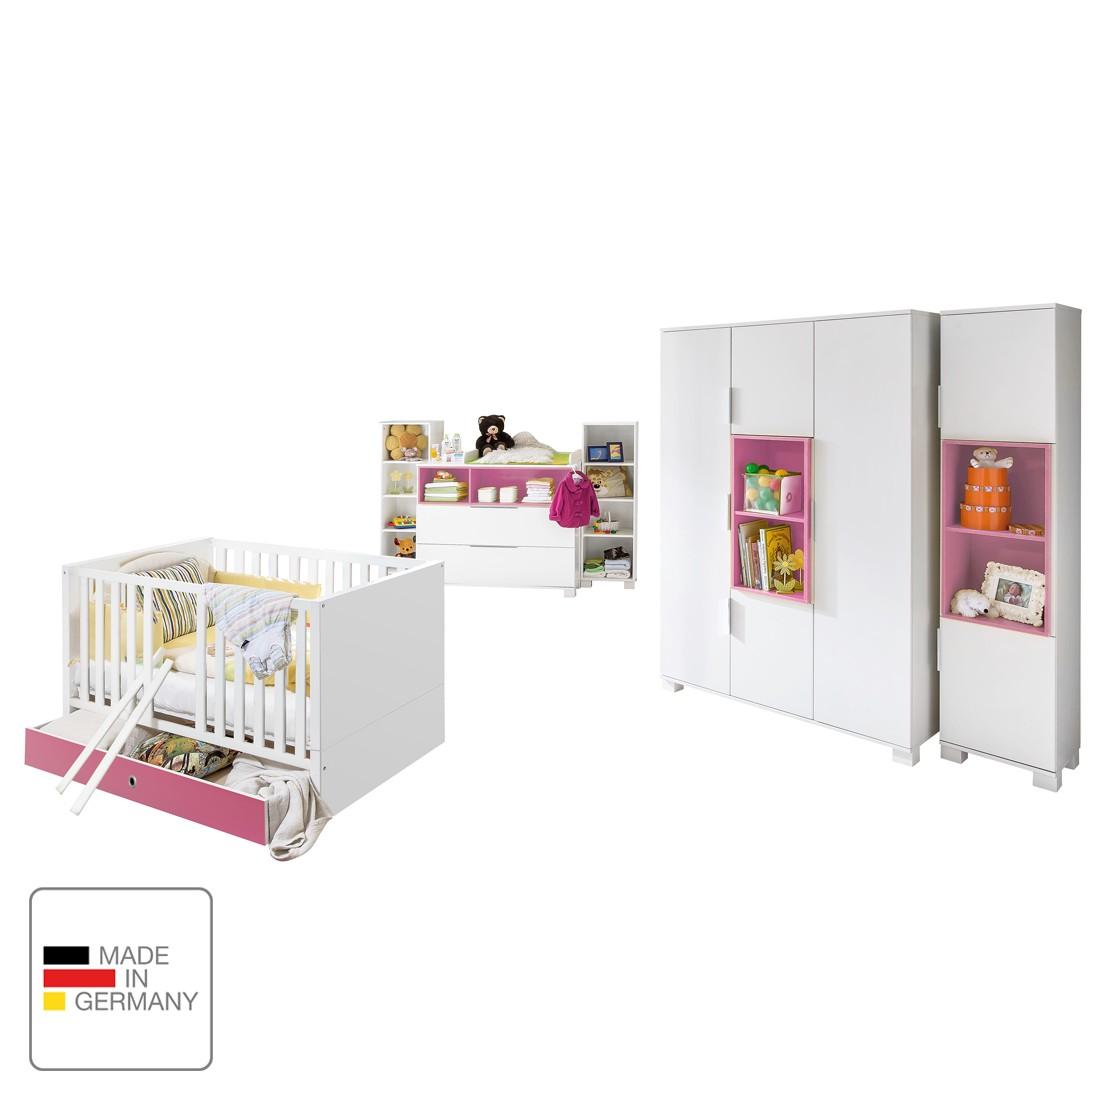 Babyzimmerkombination Joris II – Alpinweiß / Rosa, Wimex online kaufen